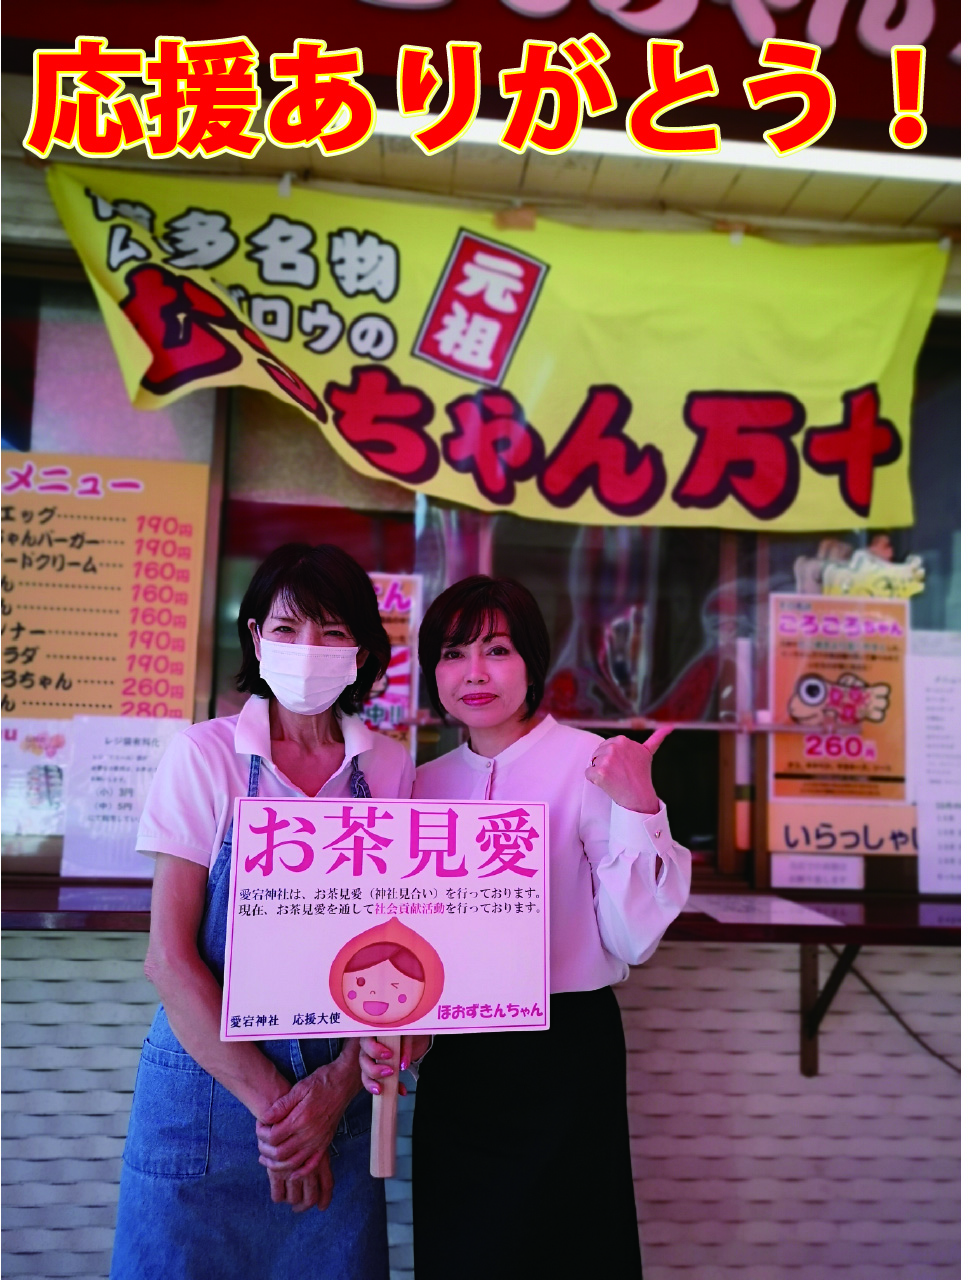 fukuoka-lp2_20210527_3-art-3-80